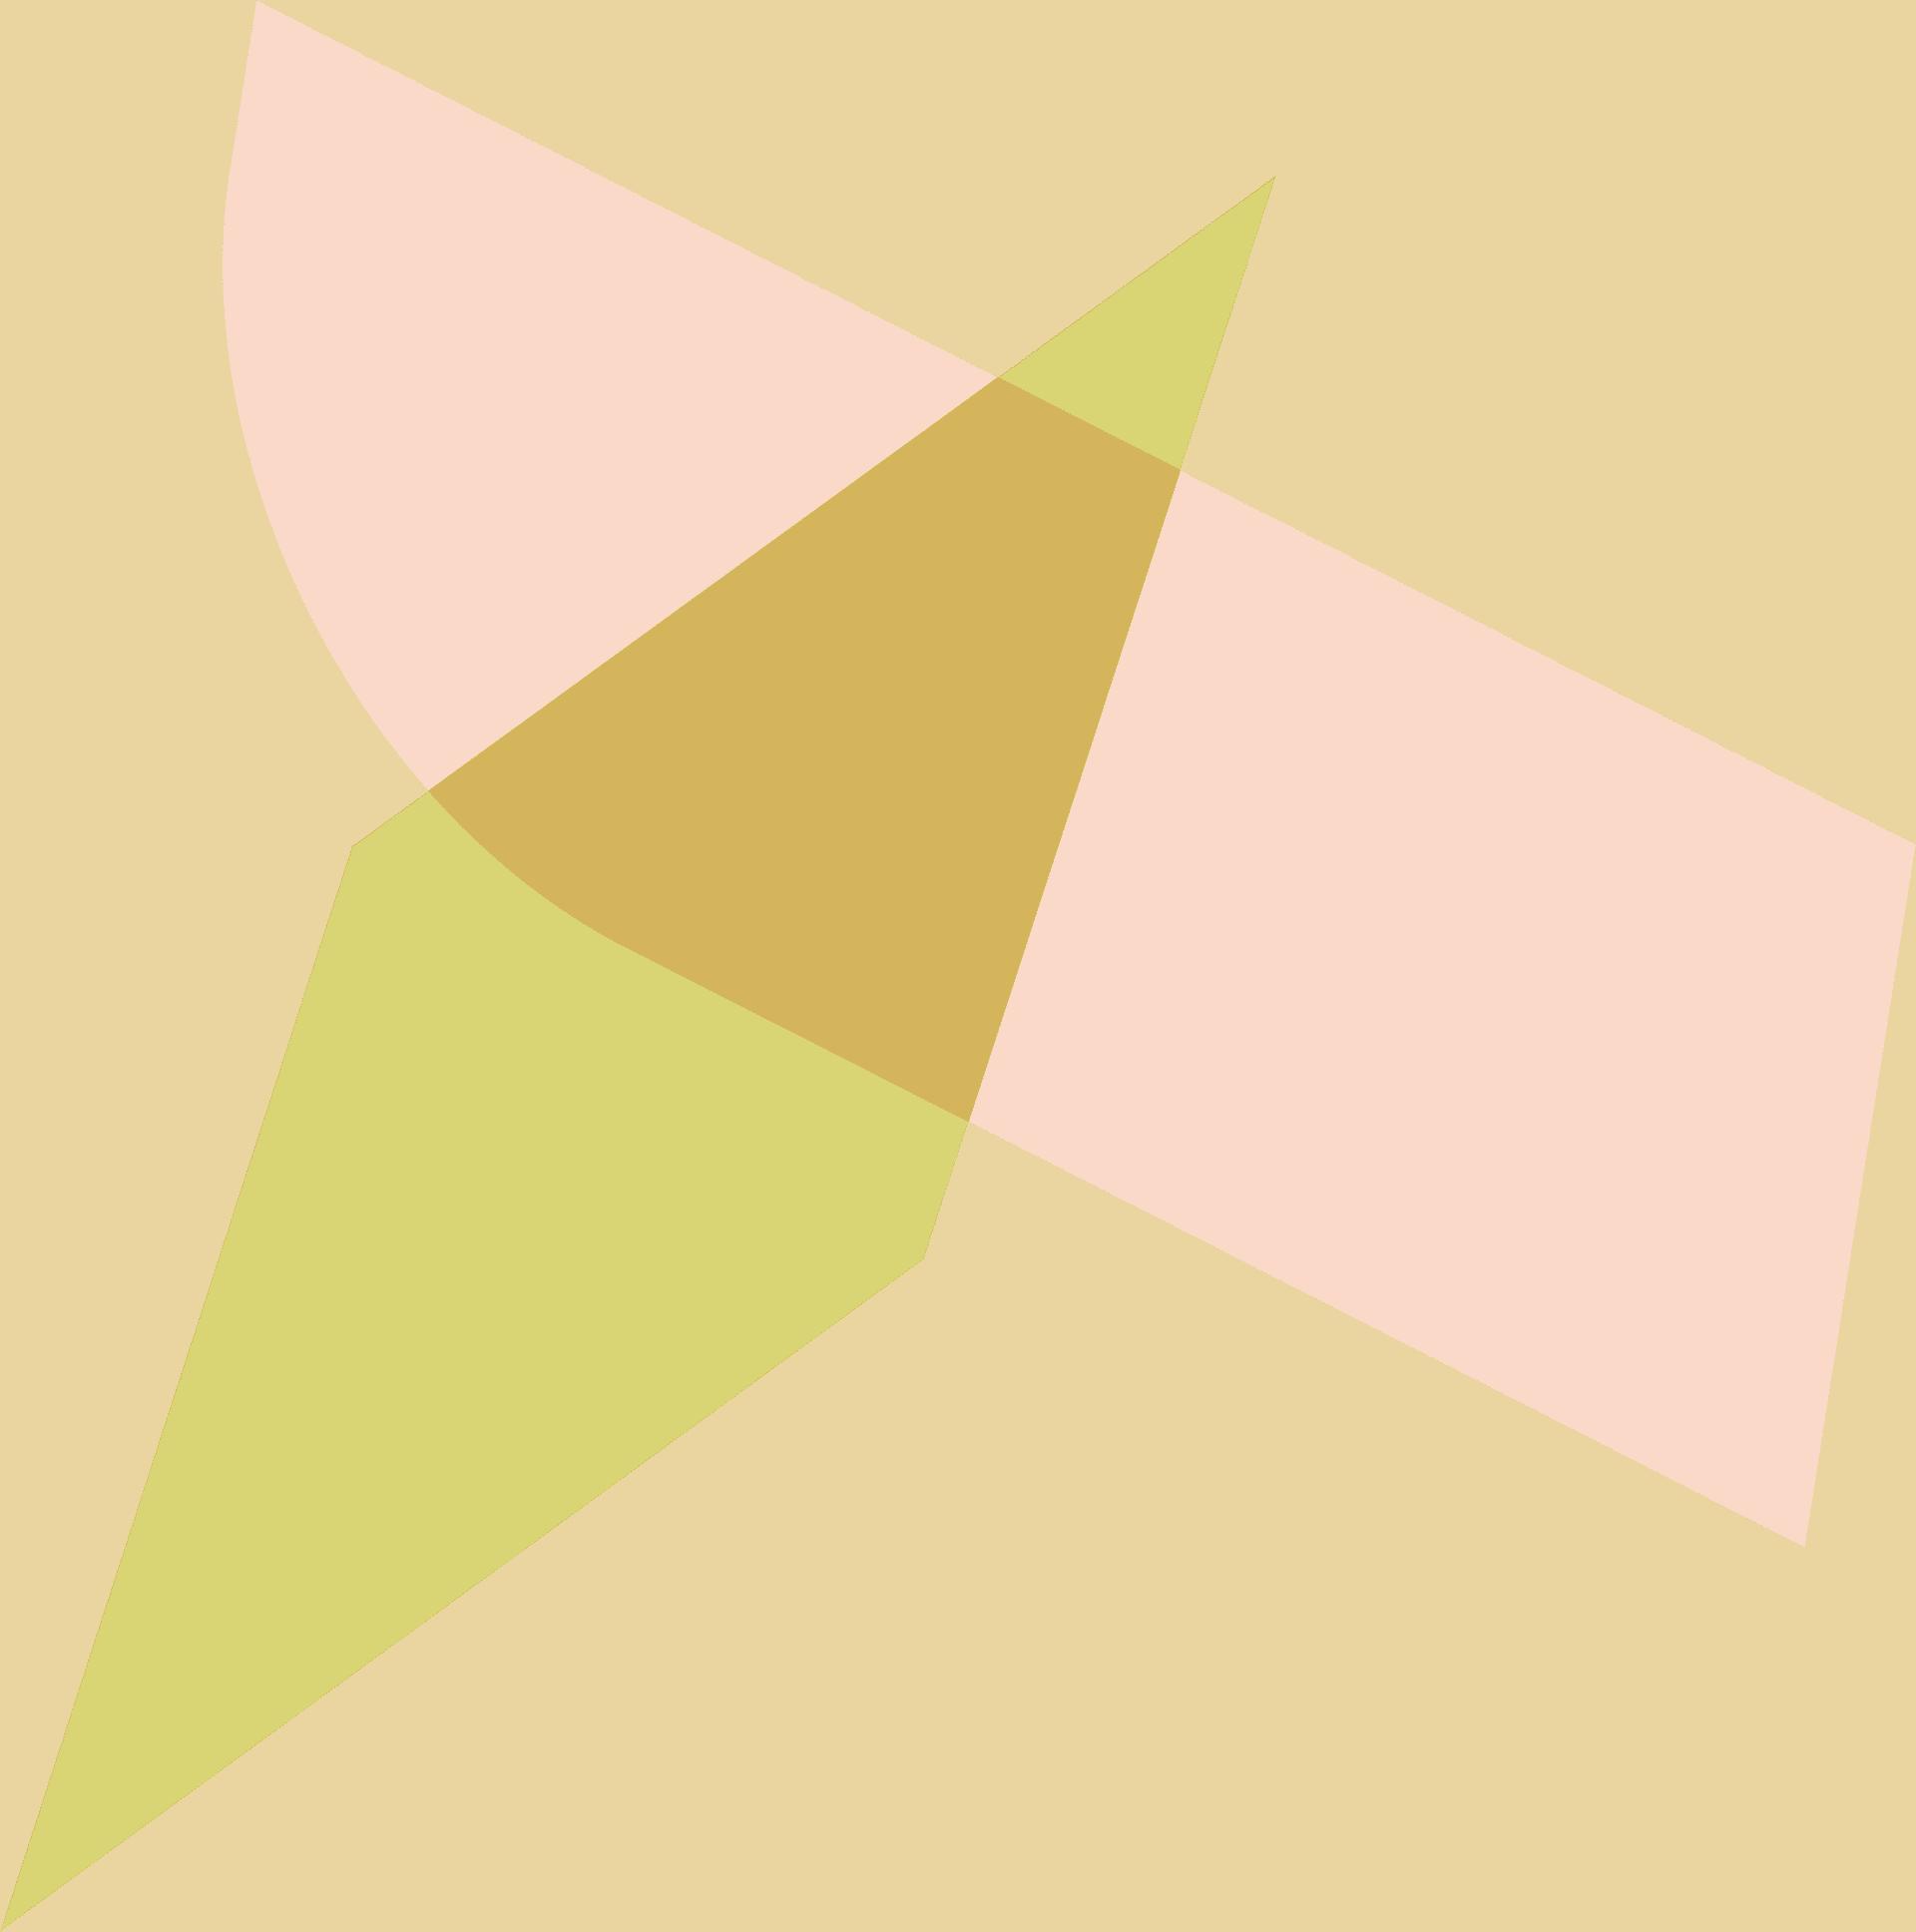 vlakken